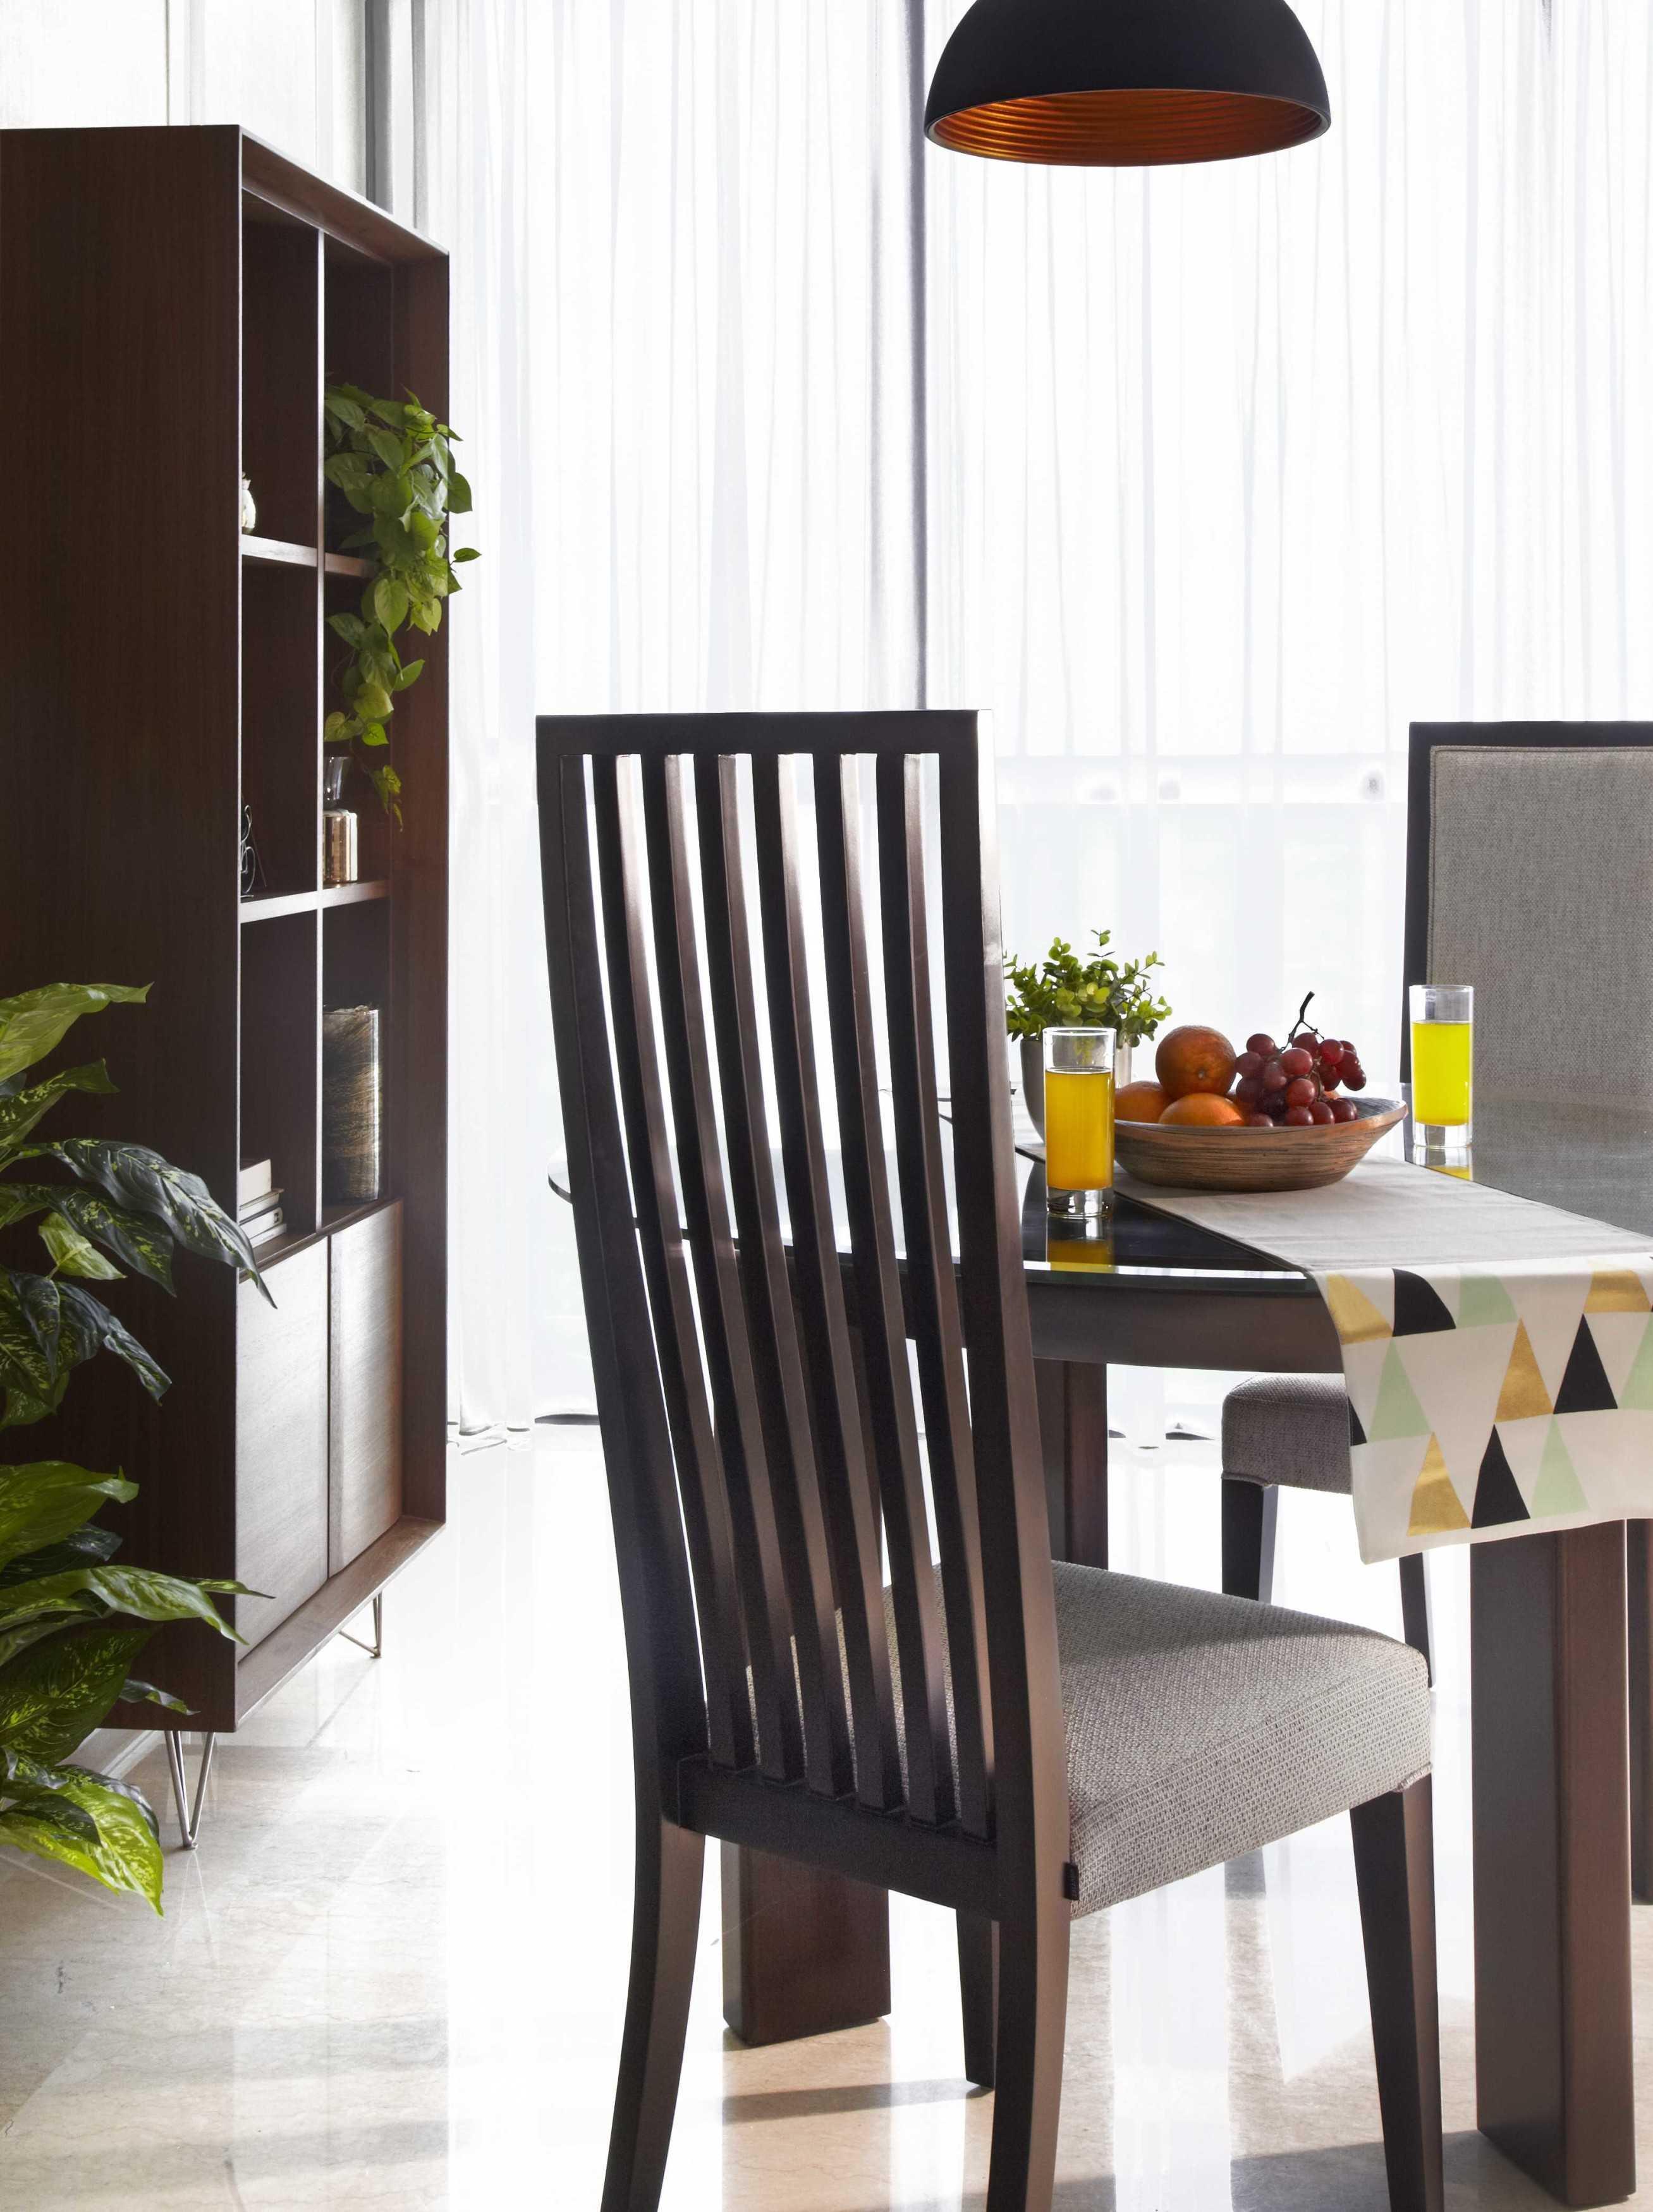 Vivere - Furniture & Home Decor Windsor Private Residence Rt.1/rw.2, Kembangan Sel., Kembangan, Kota Jakarta Barat, Daerah Khusus Ibukota Jakarta 11610, Indonesia  Dining Room Asian,wood Product Featured: - Skyline Side Chair - Donata Round Dining Table - Moduuli Display Cabinet 33834